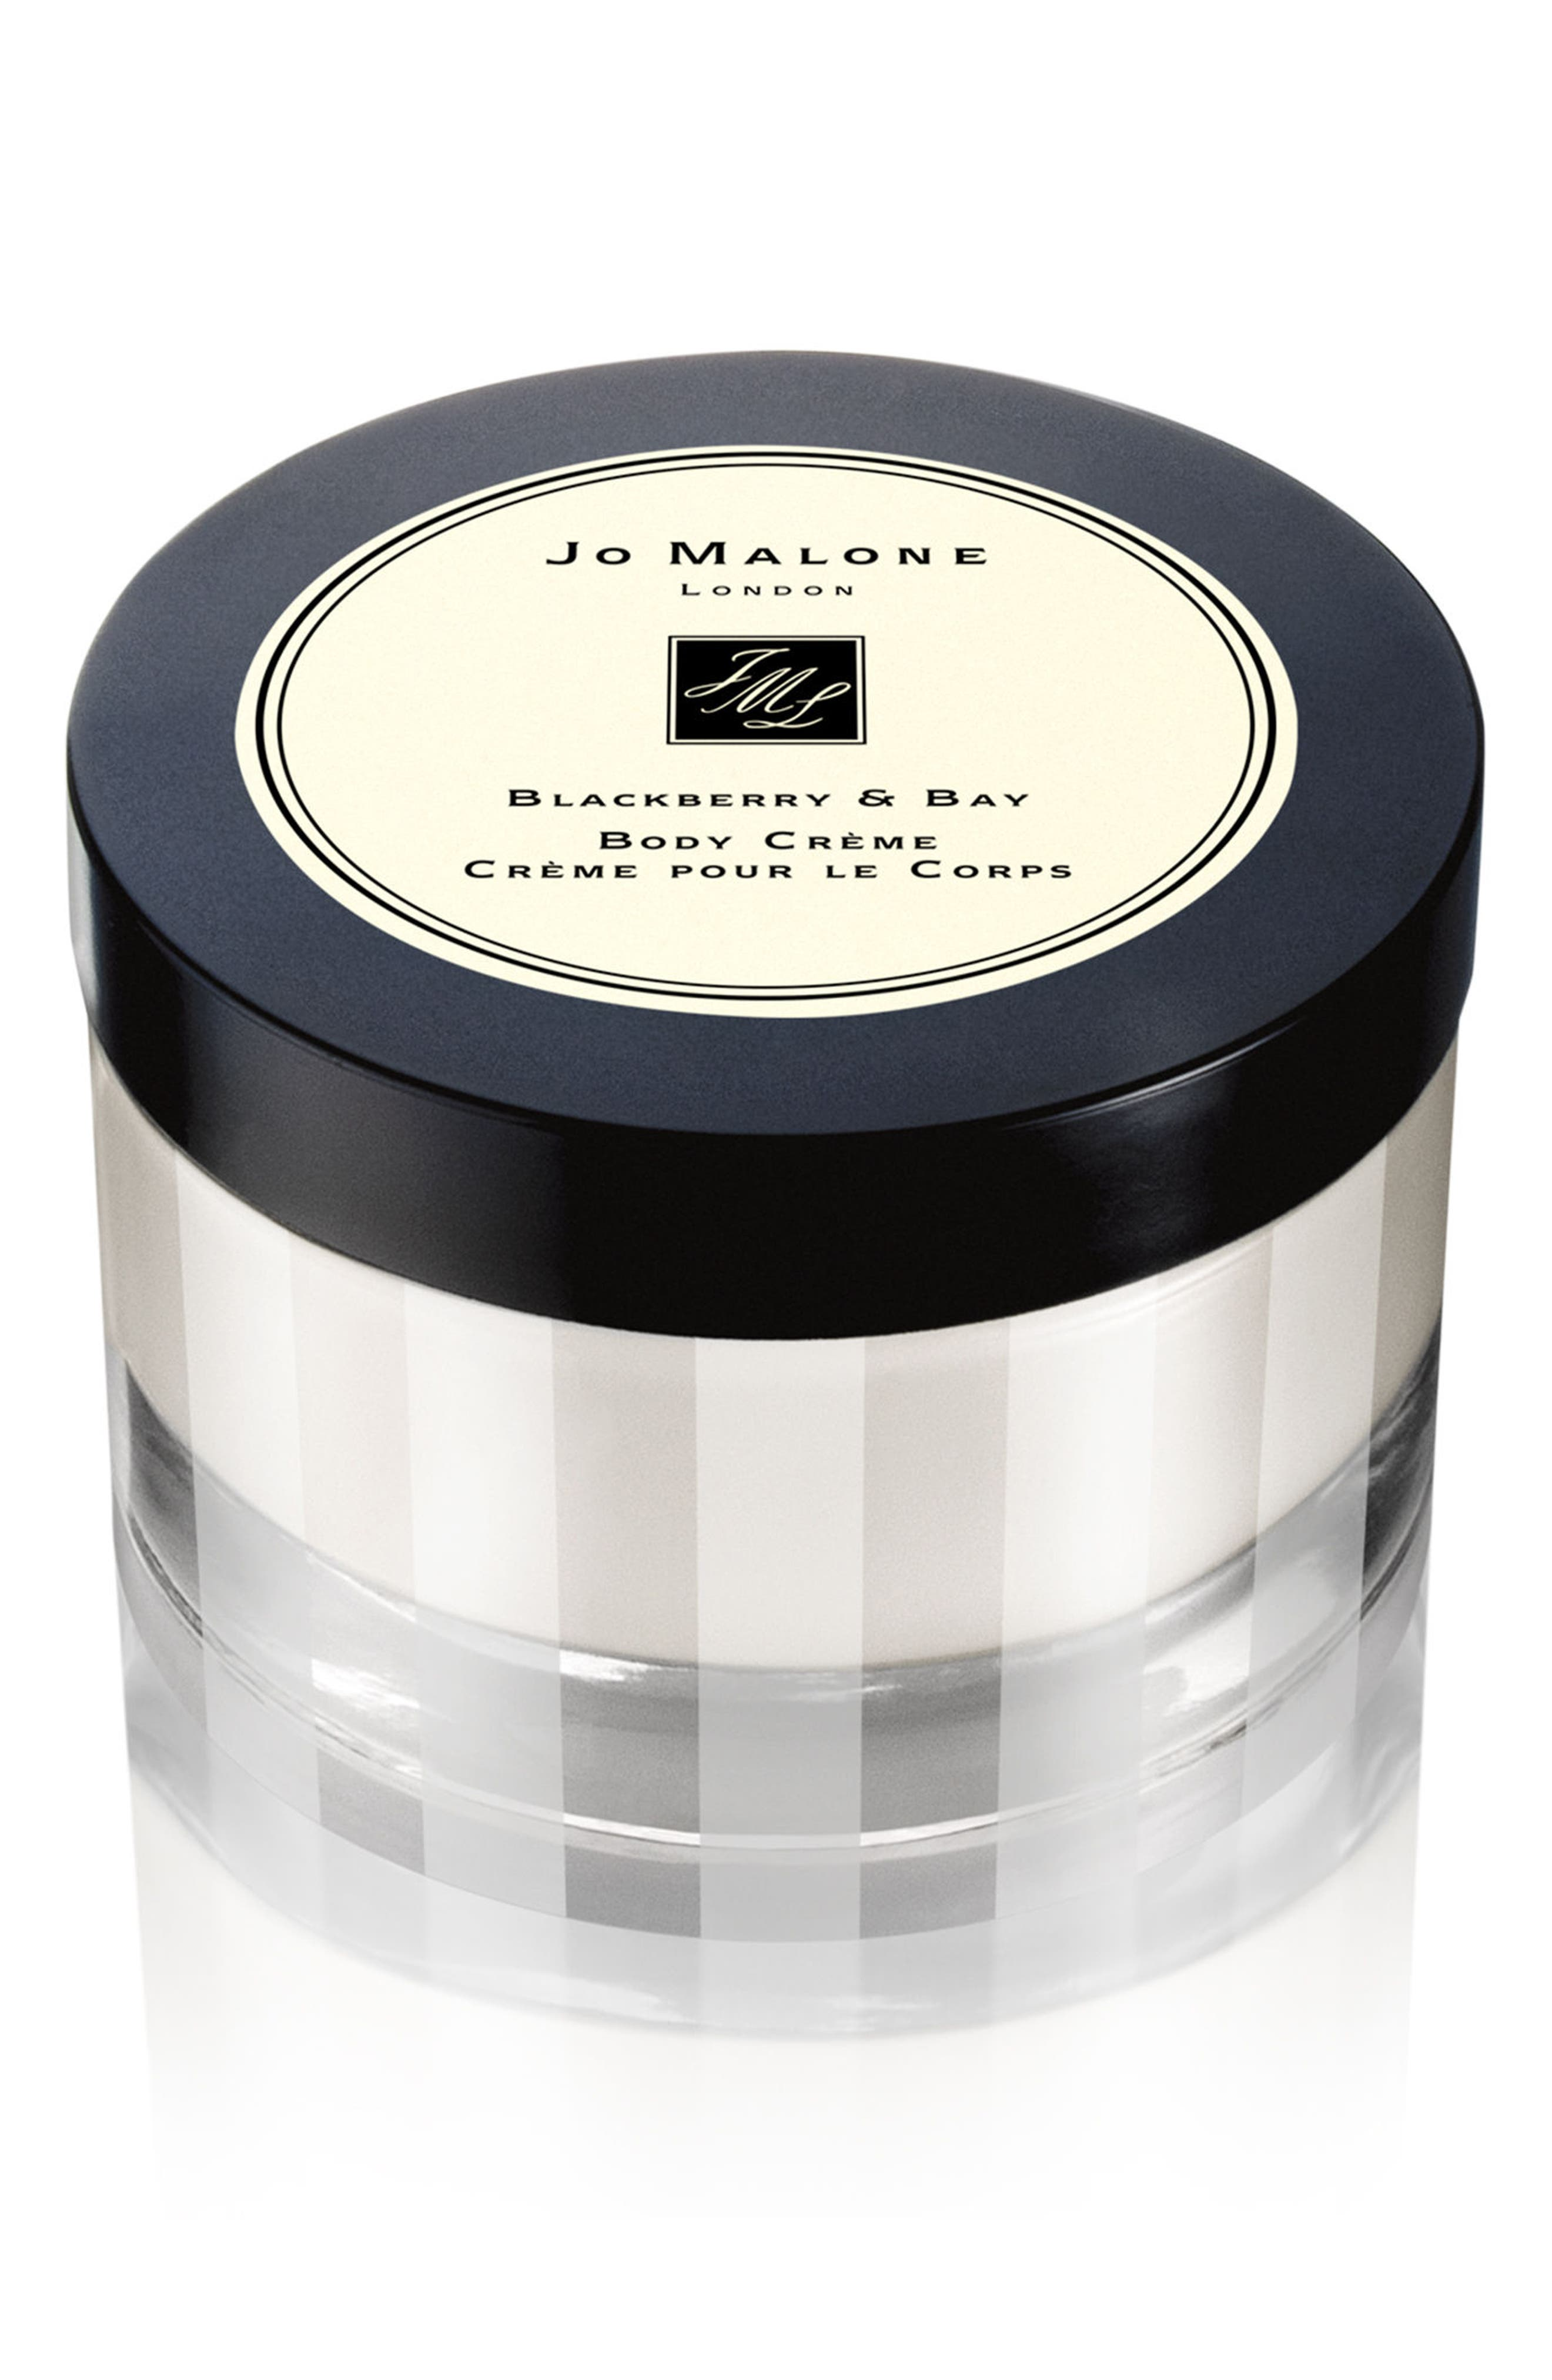 Main Image - Jo Malone London™ Blackberry & Bay Body Crème